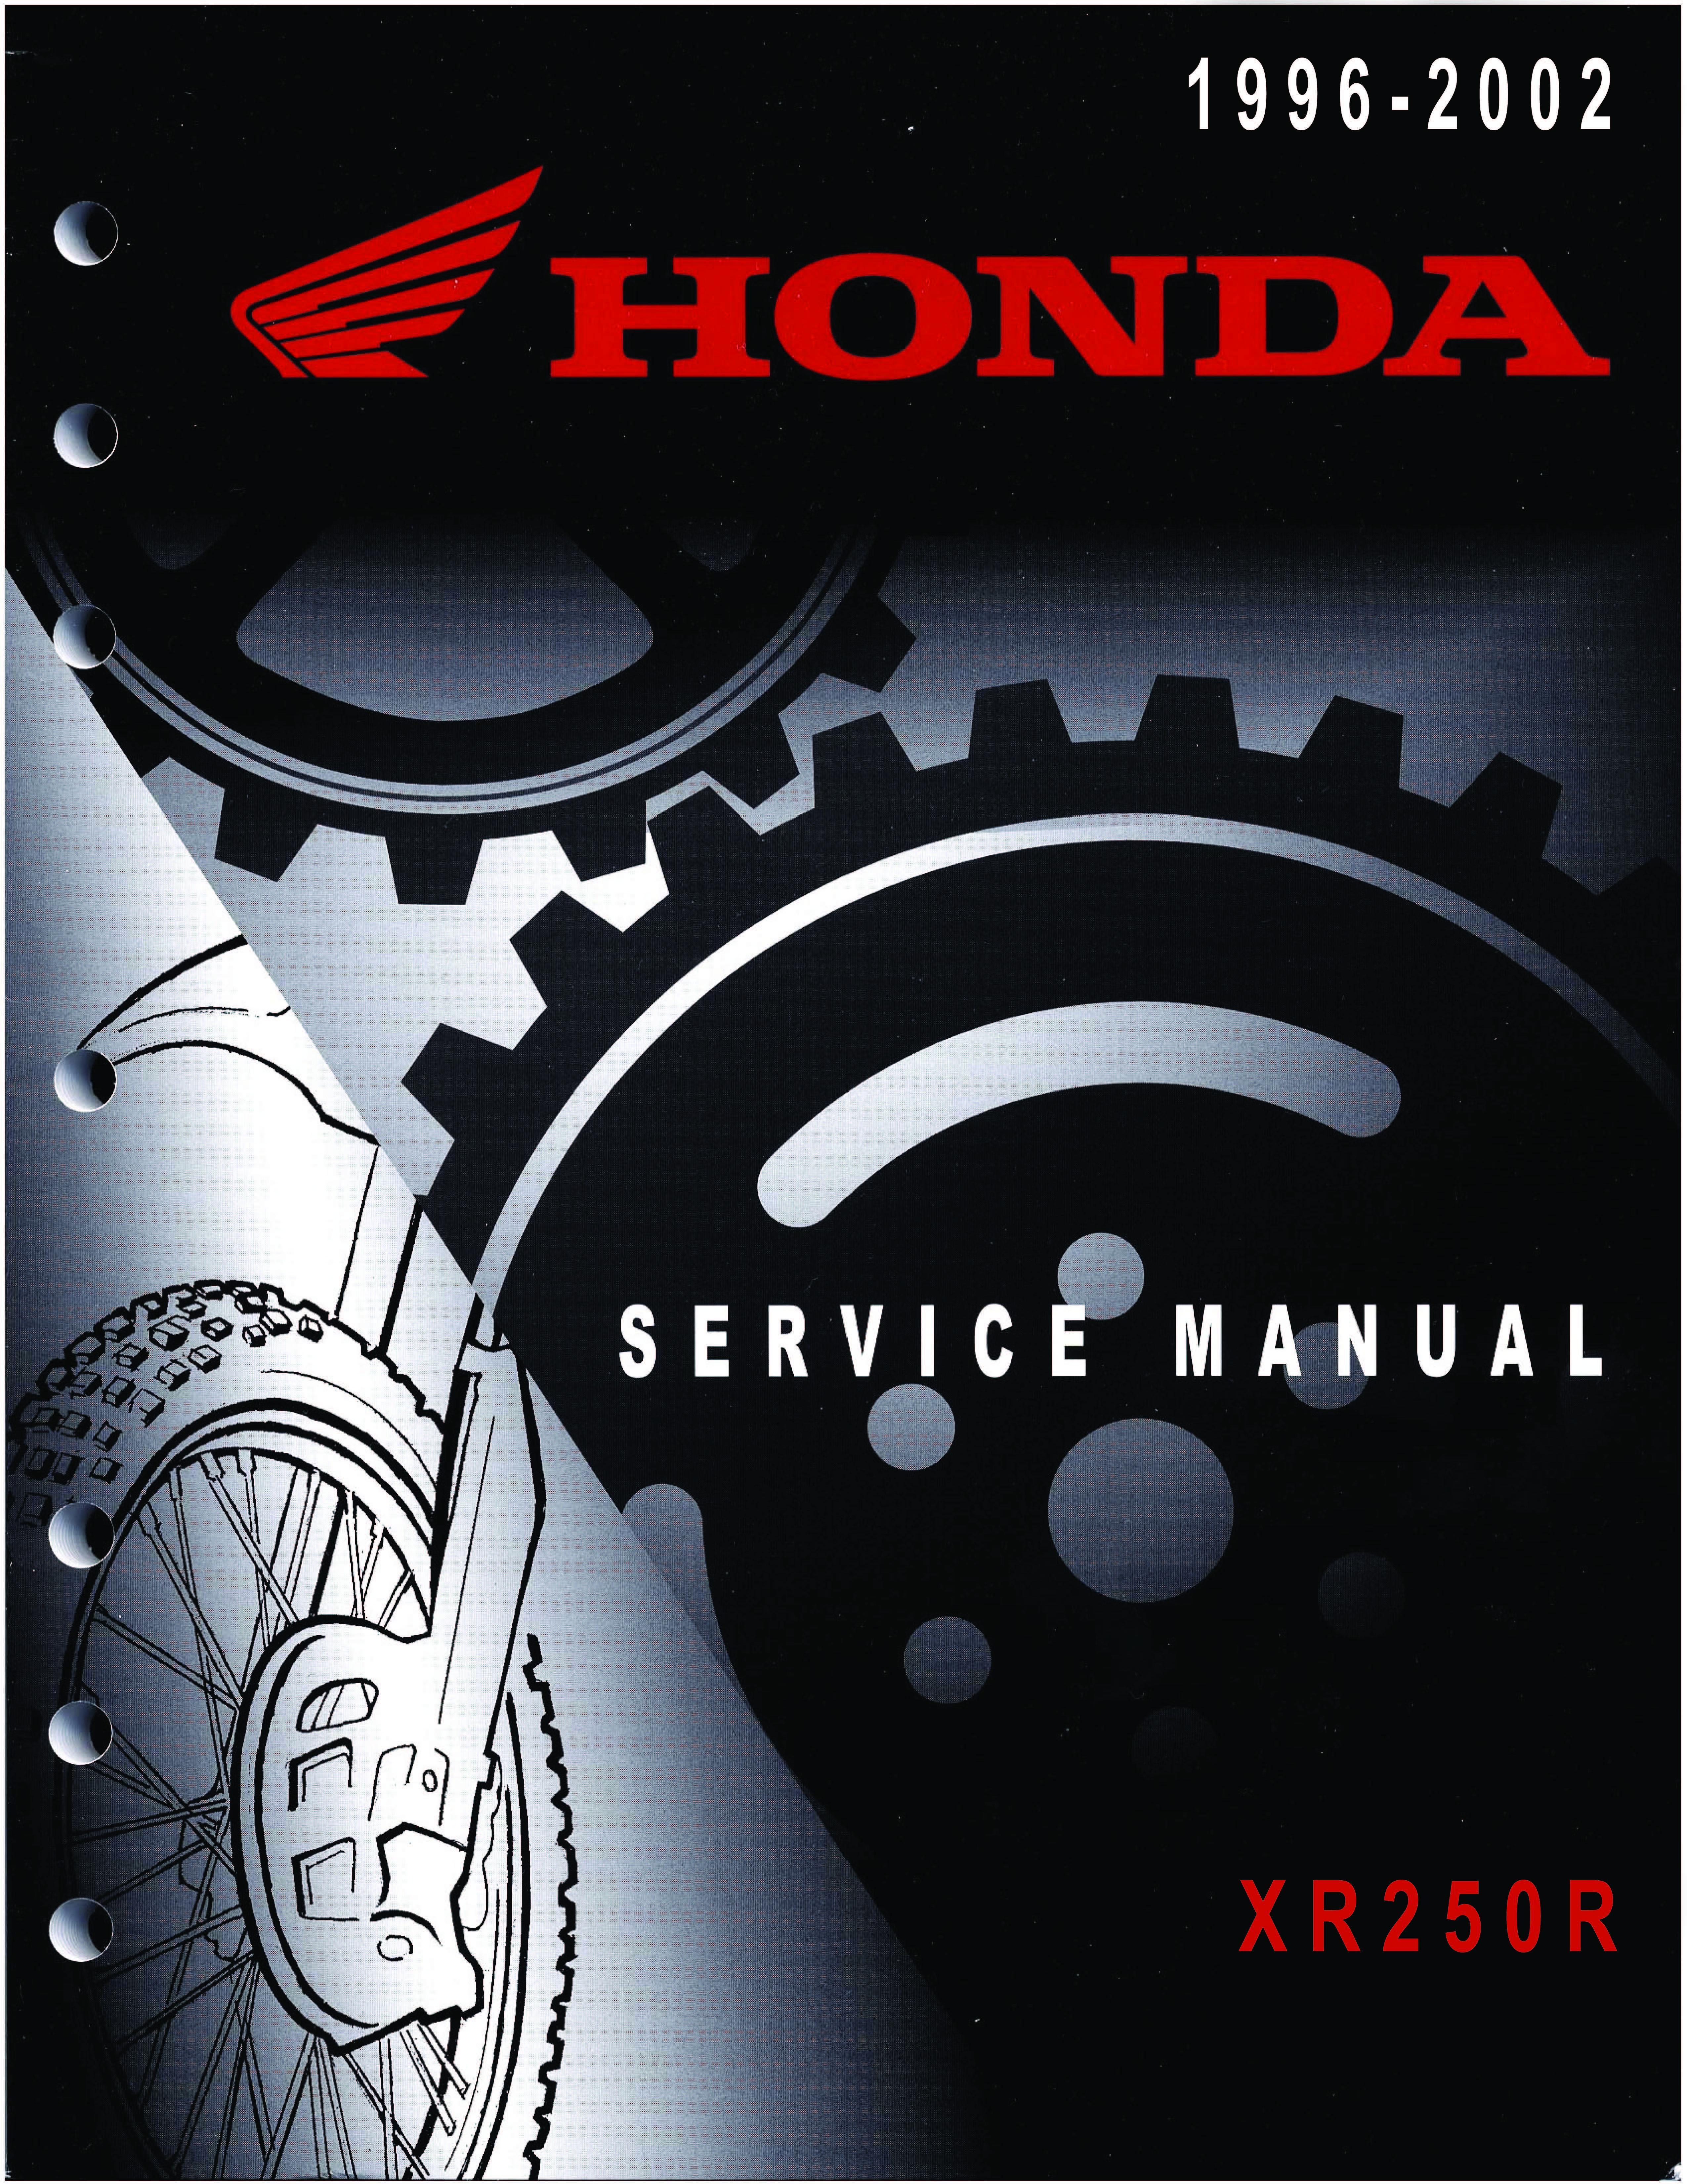 Workshop manual for Honda XR250R (1995)